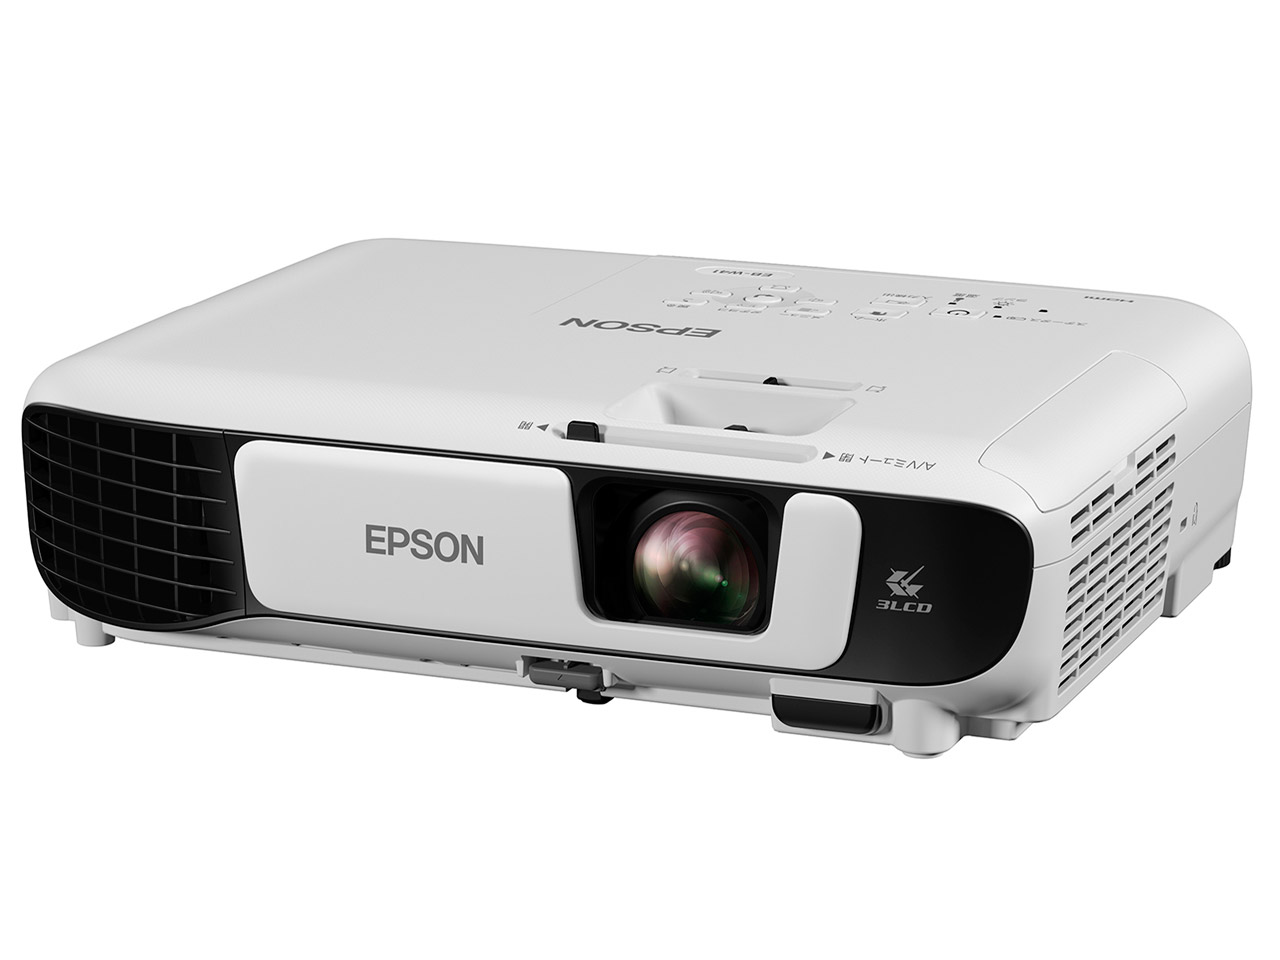 EPSON(エプソン) EB-S41 データプロジェクター【KK9N0D18P】